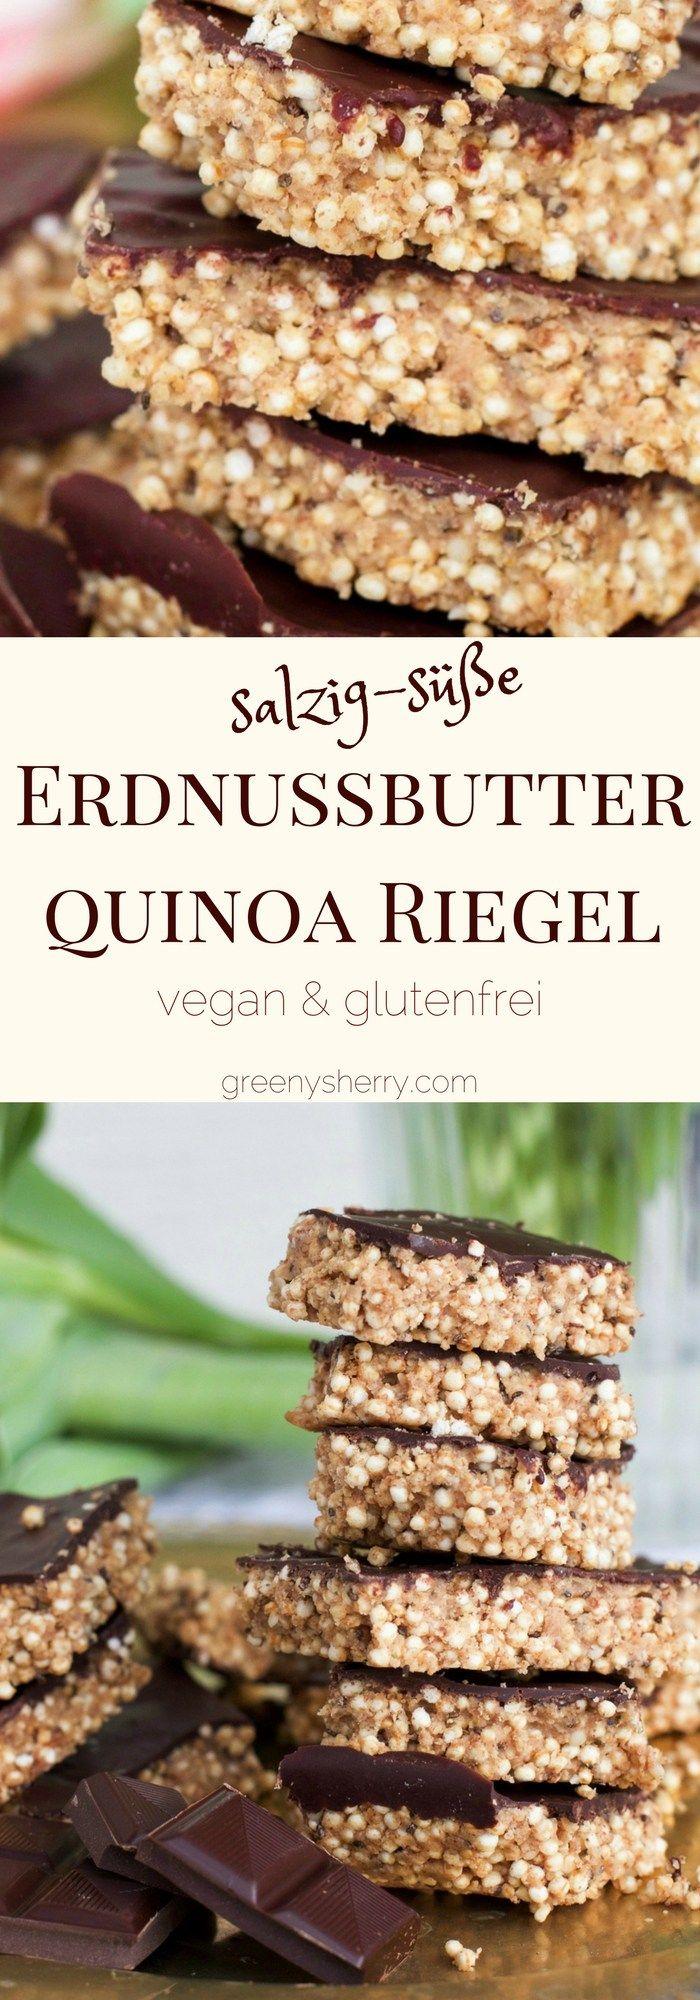 Salzig-süße Erdnussbutter Quinoa Riegel mit Schokolade (vegan &glutenfrei